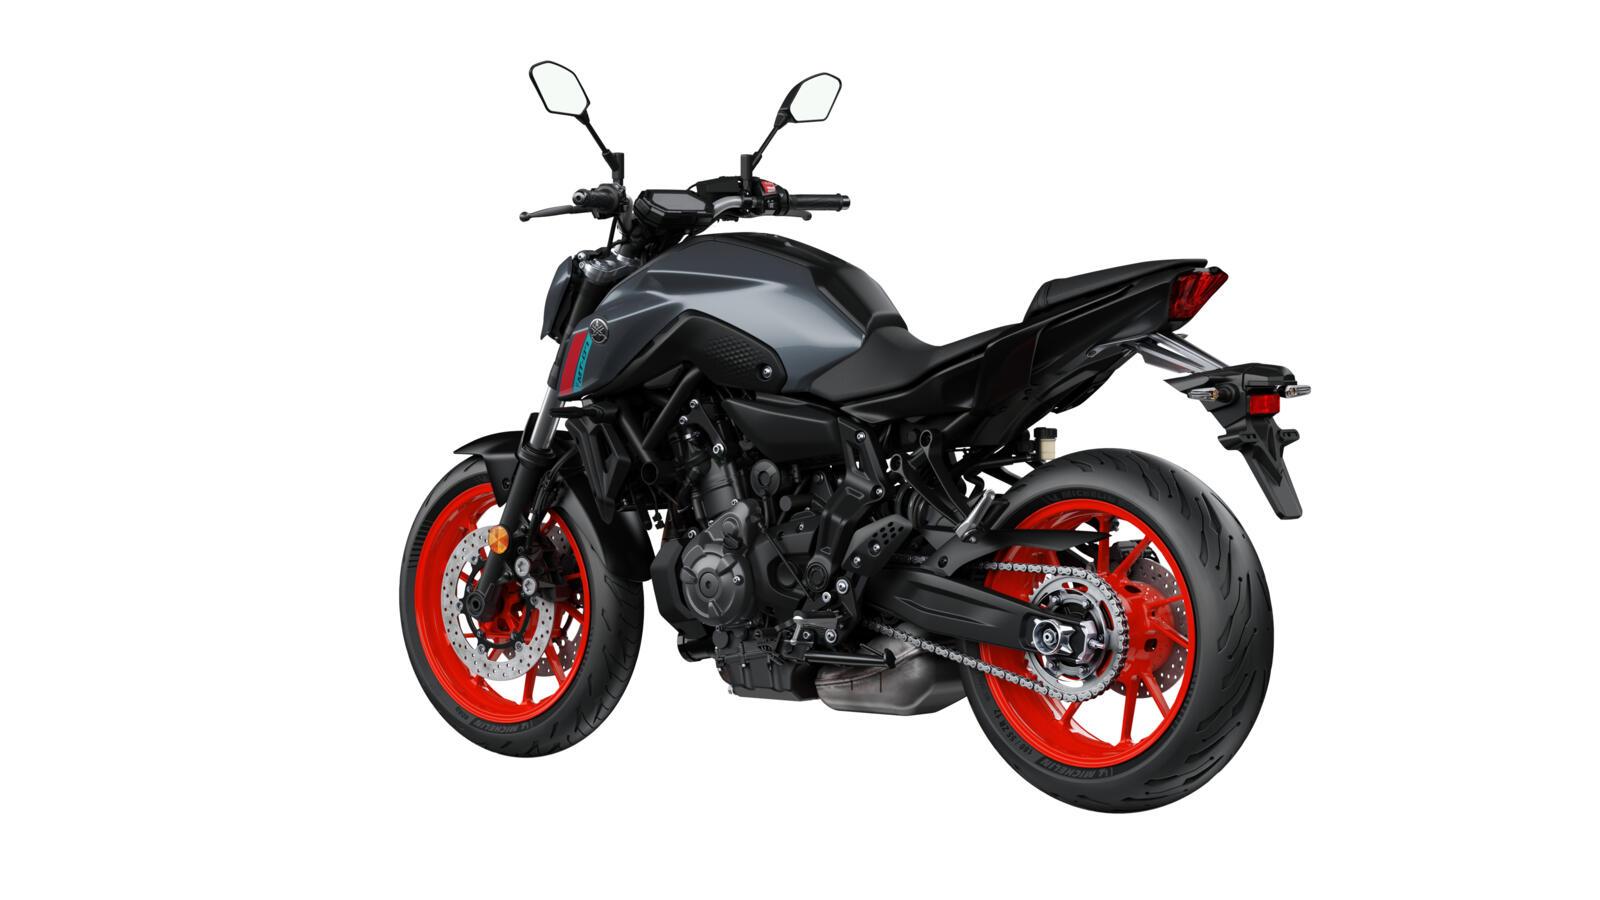 Yamaha-MT-07-my2021-32